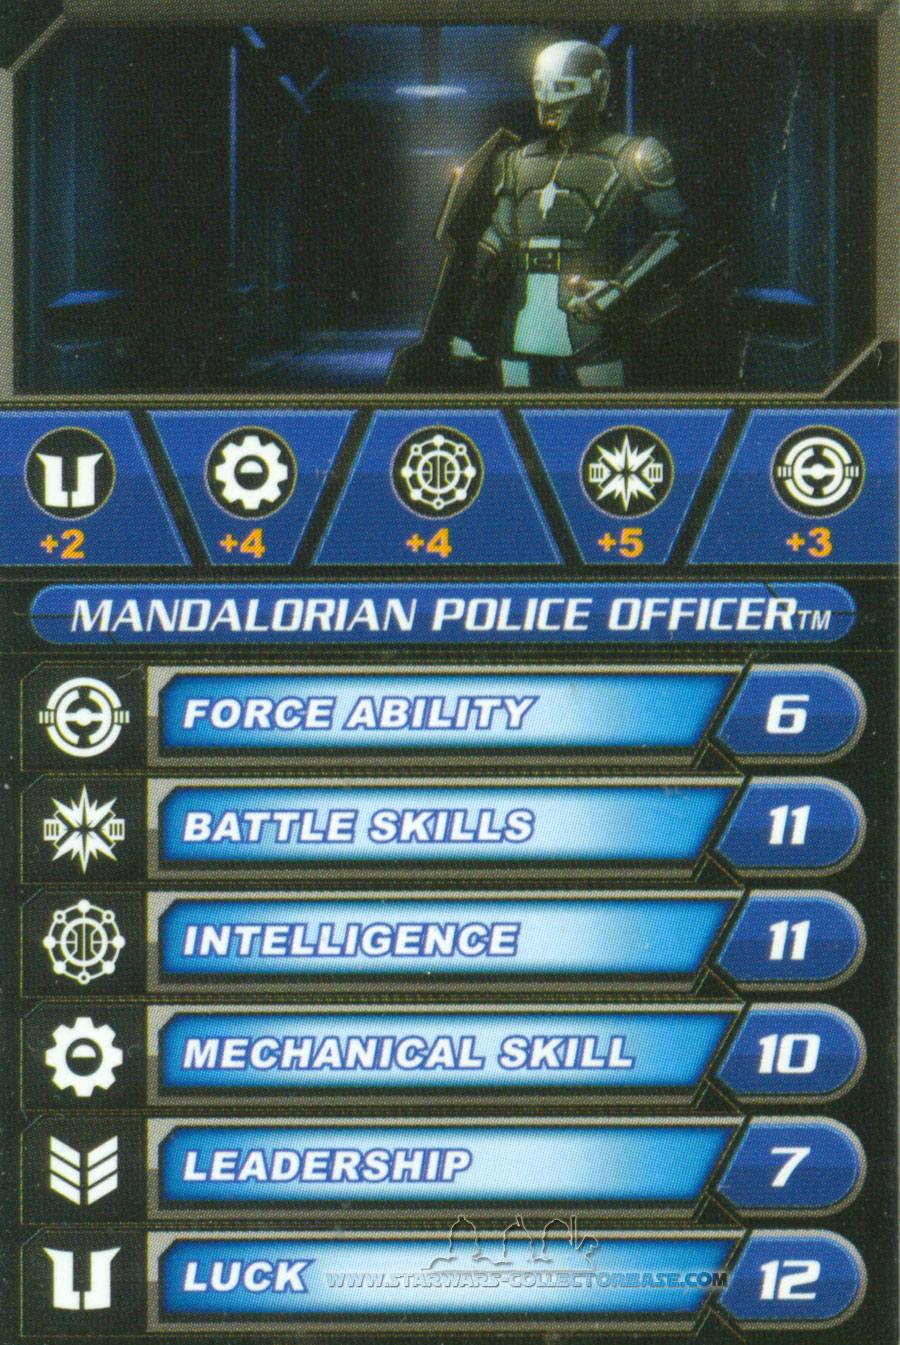 Mandalorian Police Officer CW09 TCW